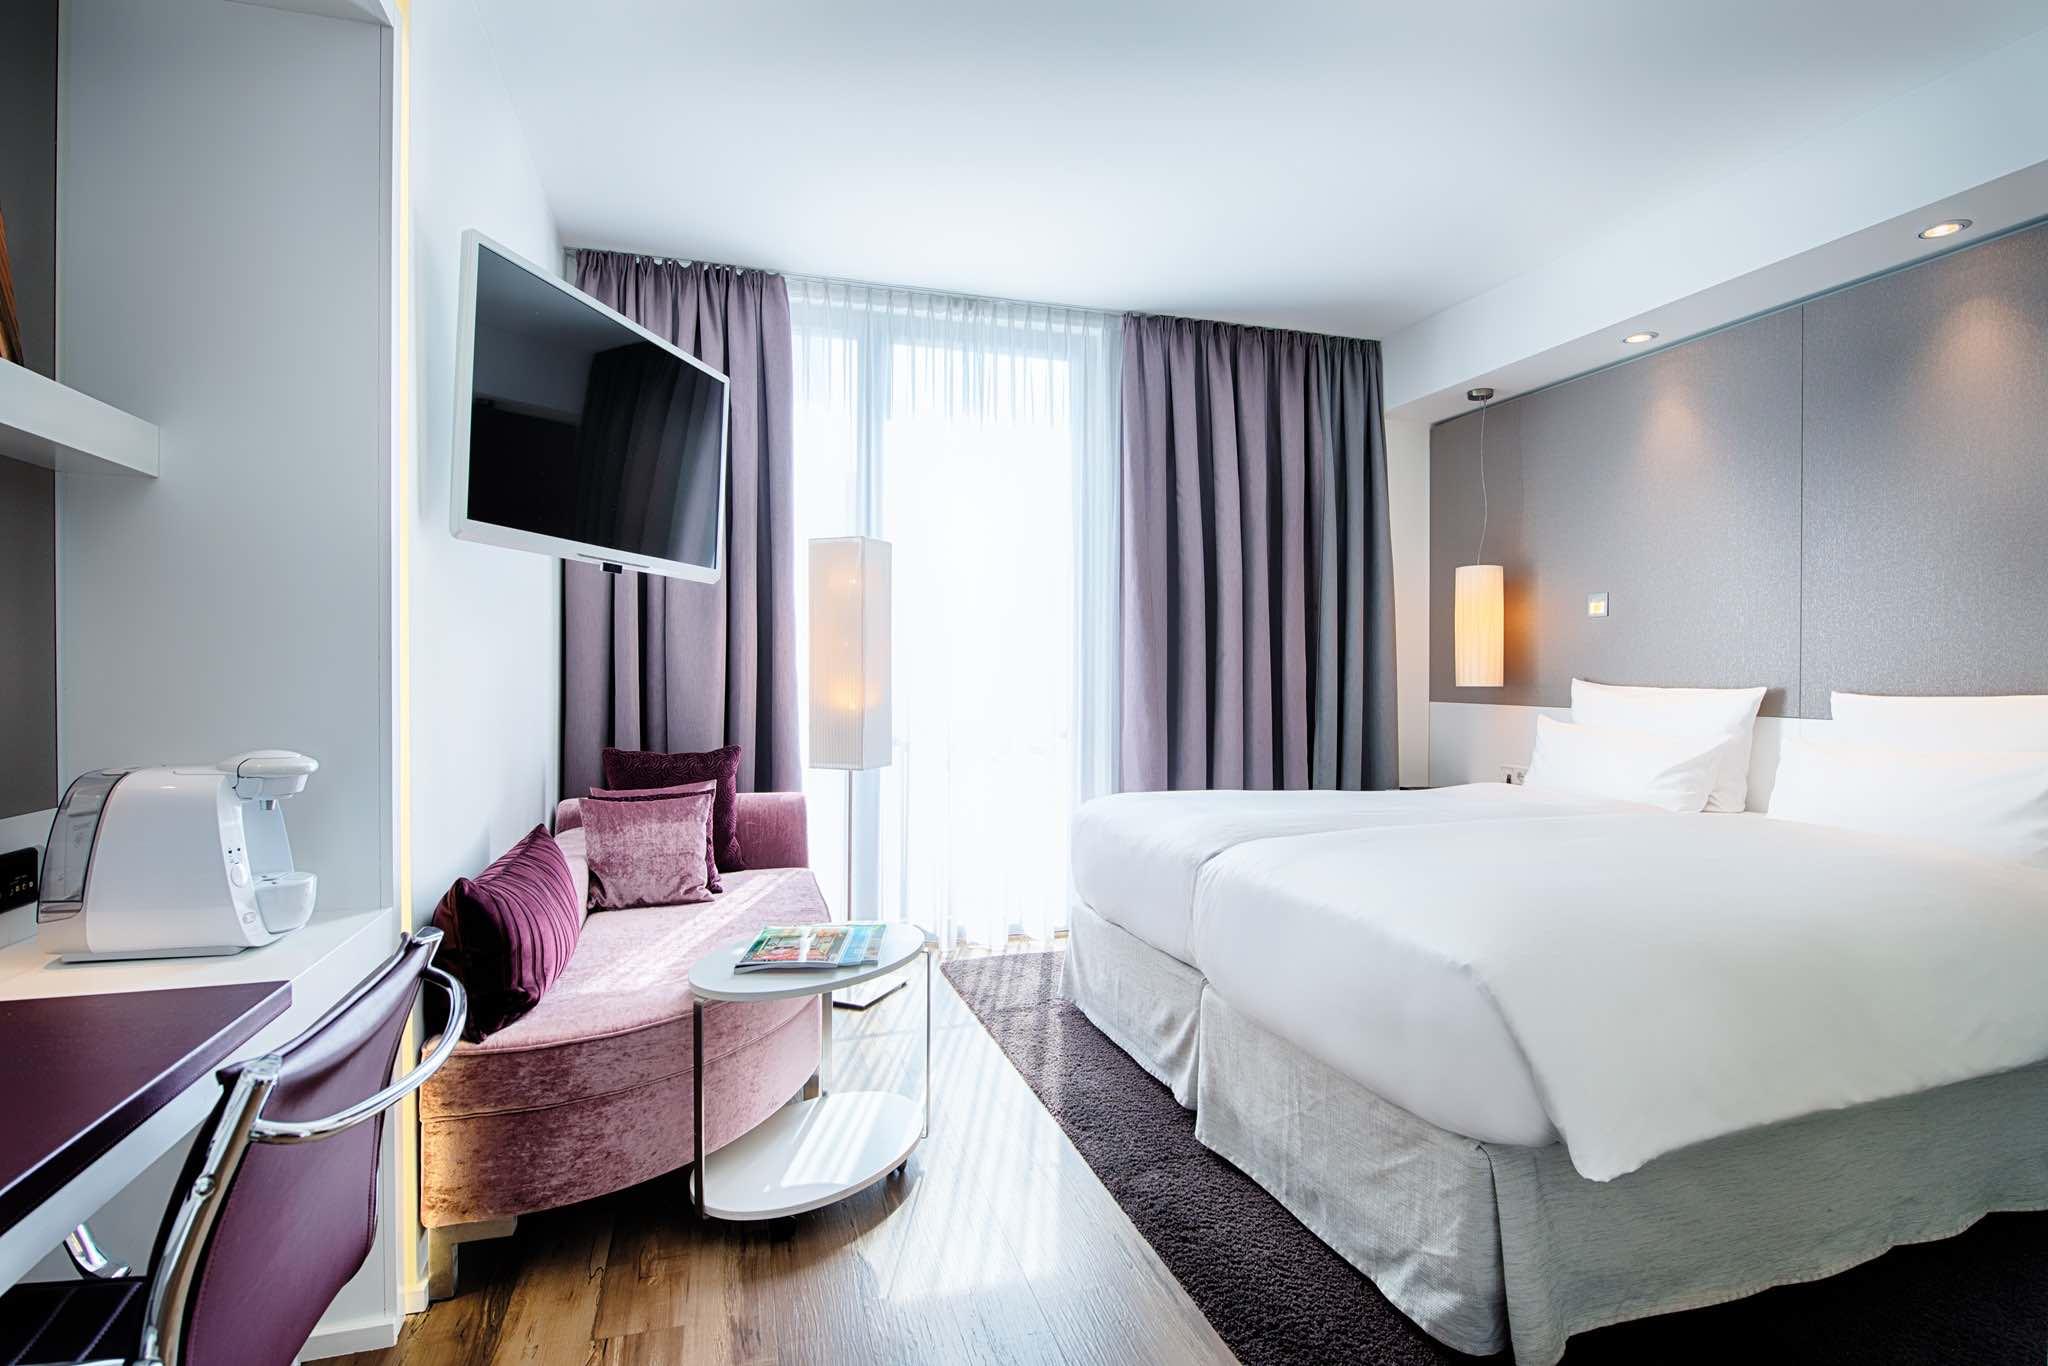 Boutique Hotel i31 Berlin Mitte bedroom